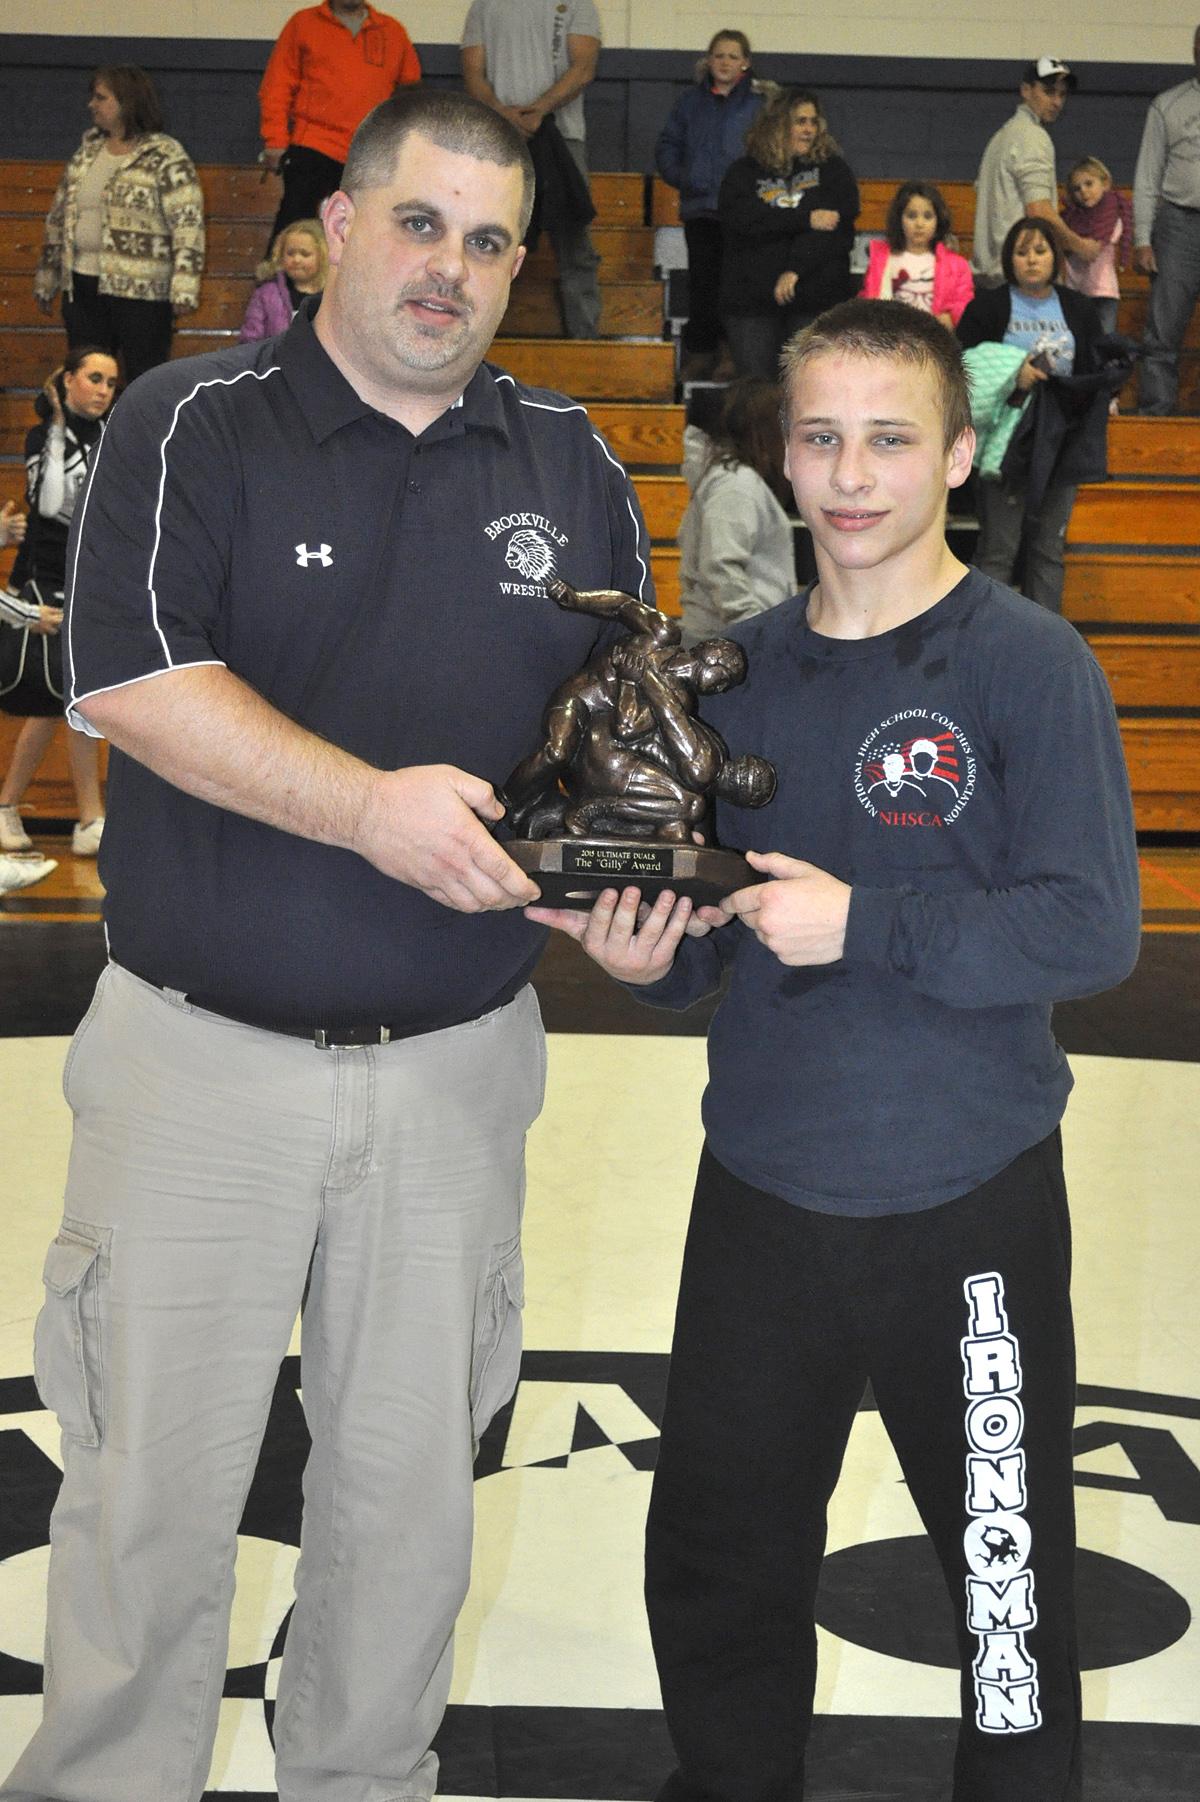 2015 Gilly Award